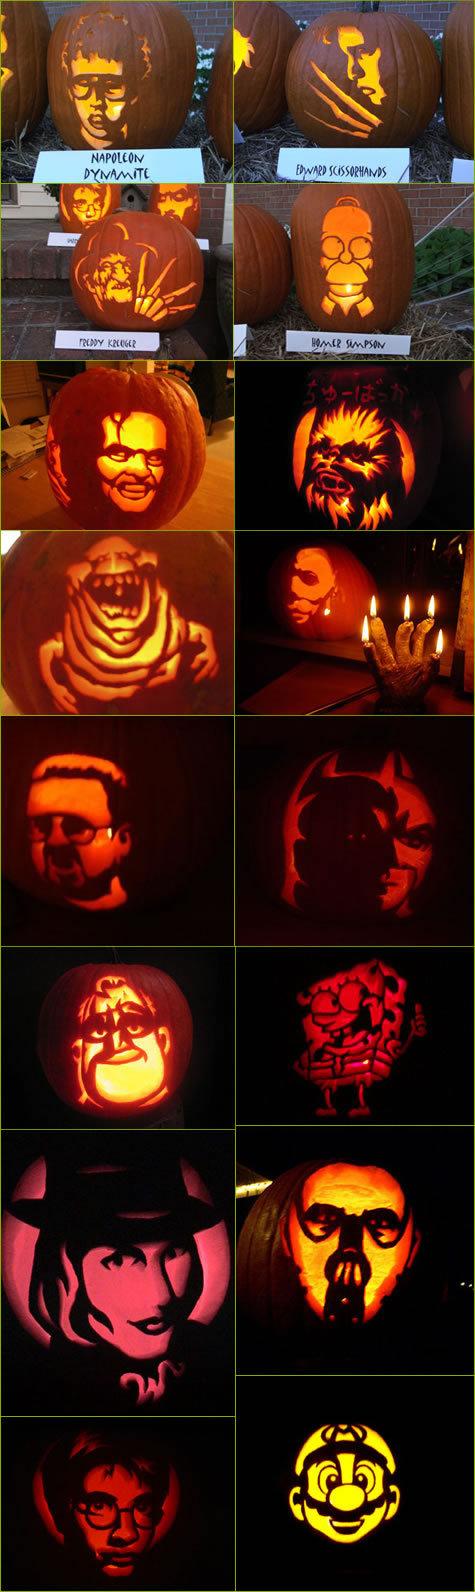 Awesome Halloween Pumpkins. Win.. whos the one beside spongebob